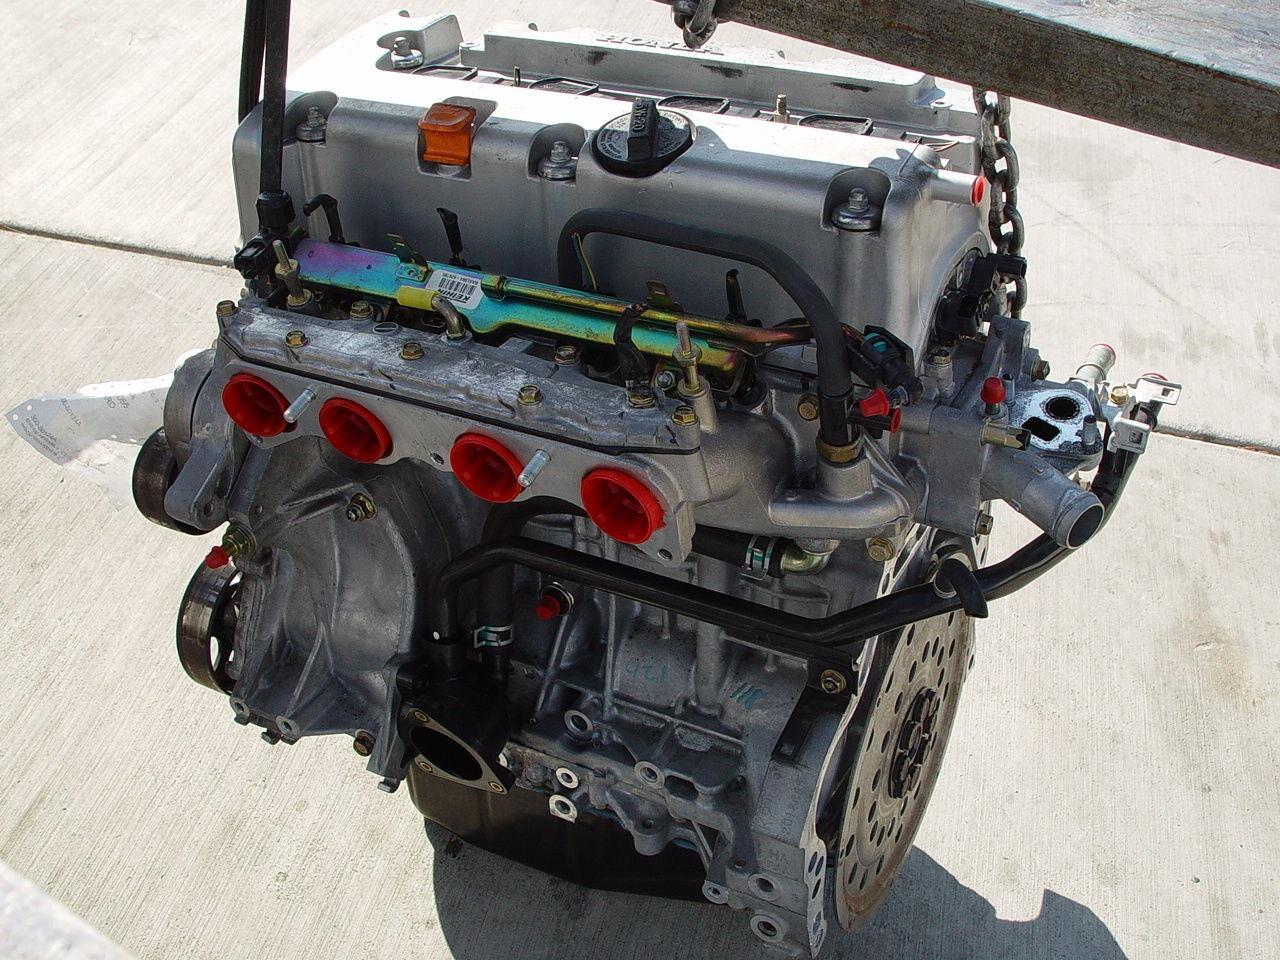 honda accord 03 07 engine motor long block assembly 2 4l 4. Black Bedroom Furniture Sets. Home Design Ideas